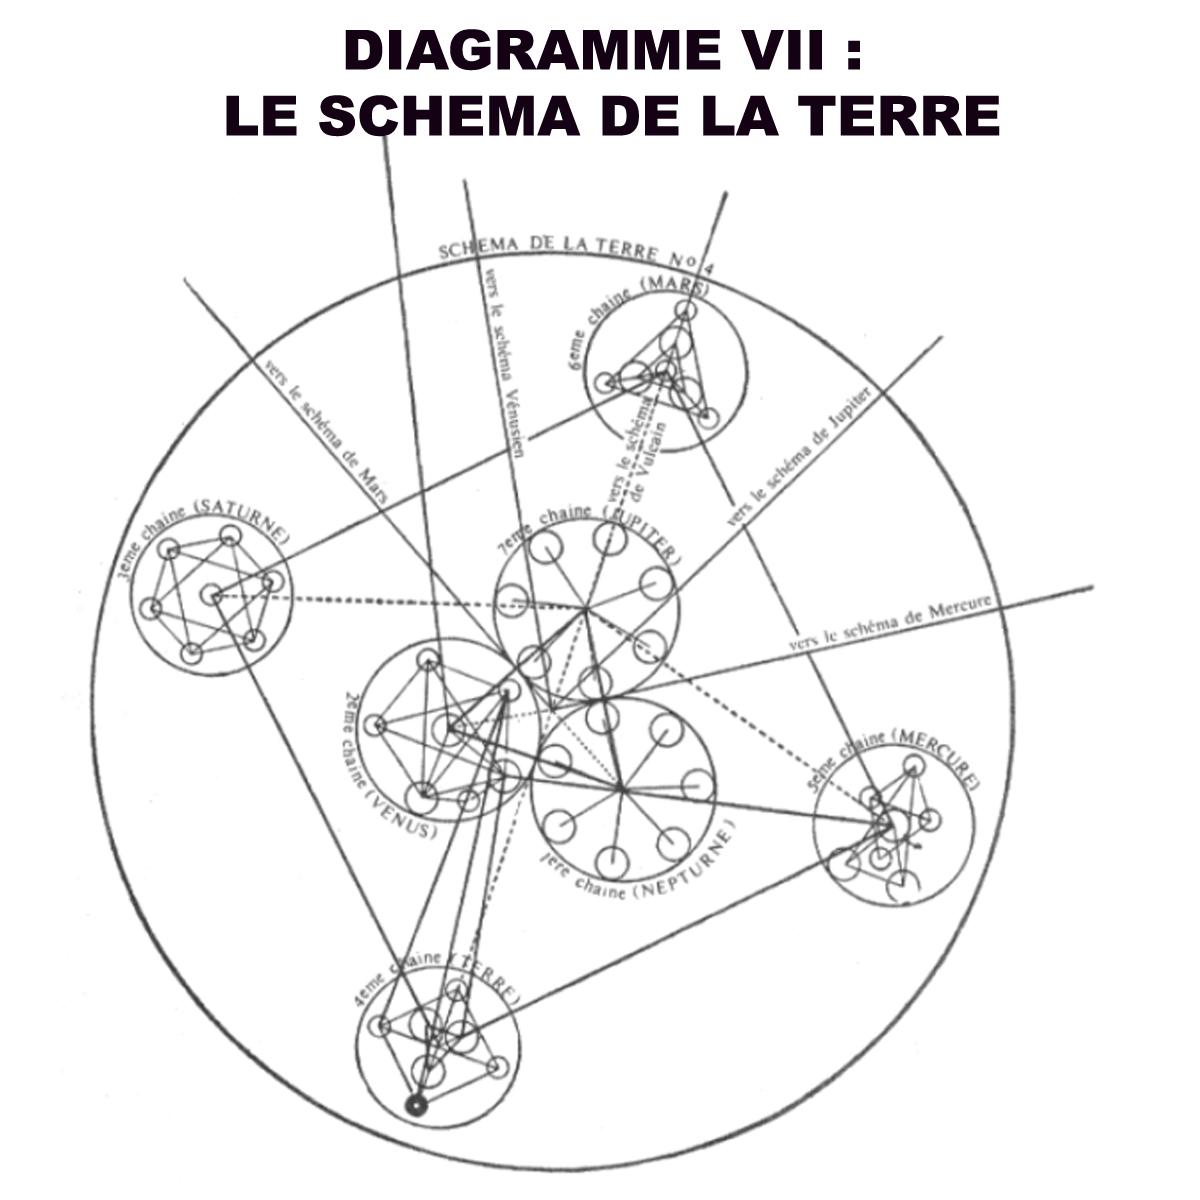 DIAGRAMME 7